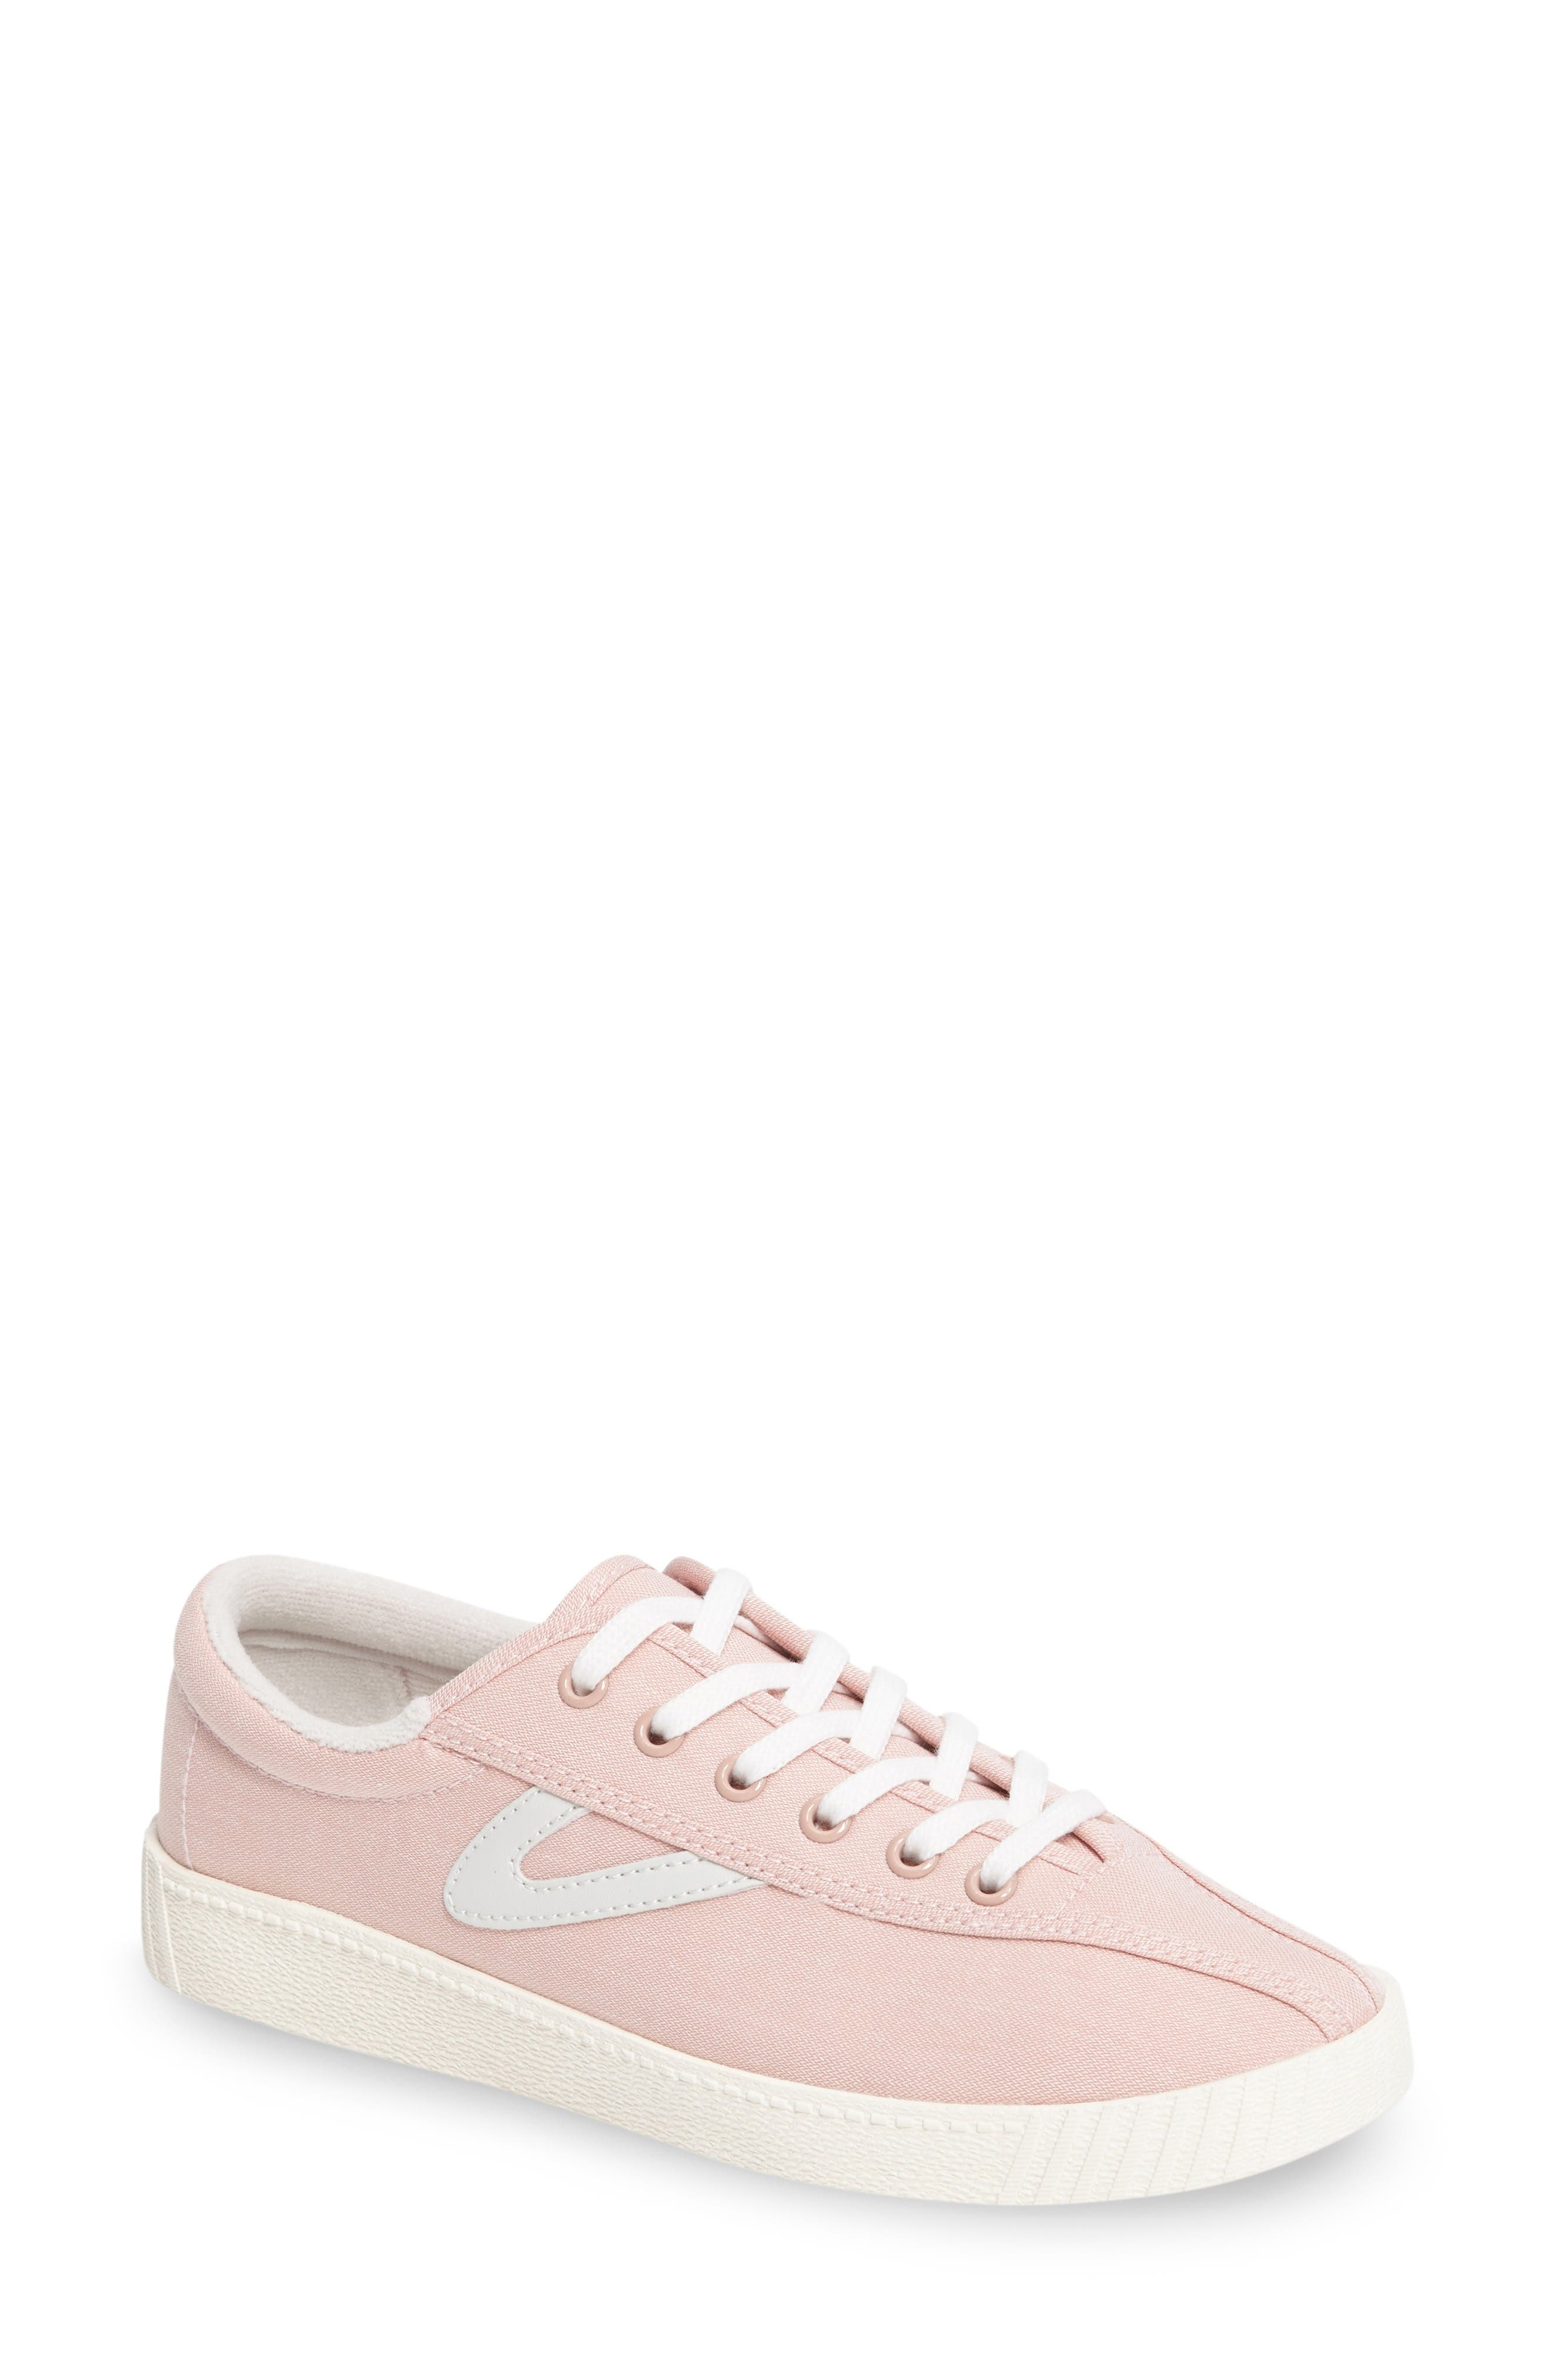 TRETORN 'Nylite' Sneaker